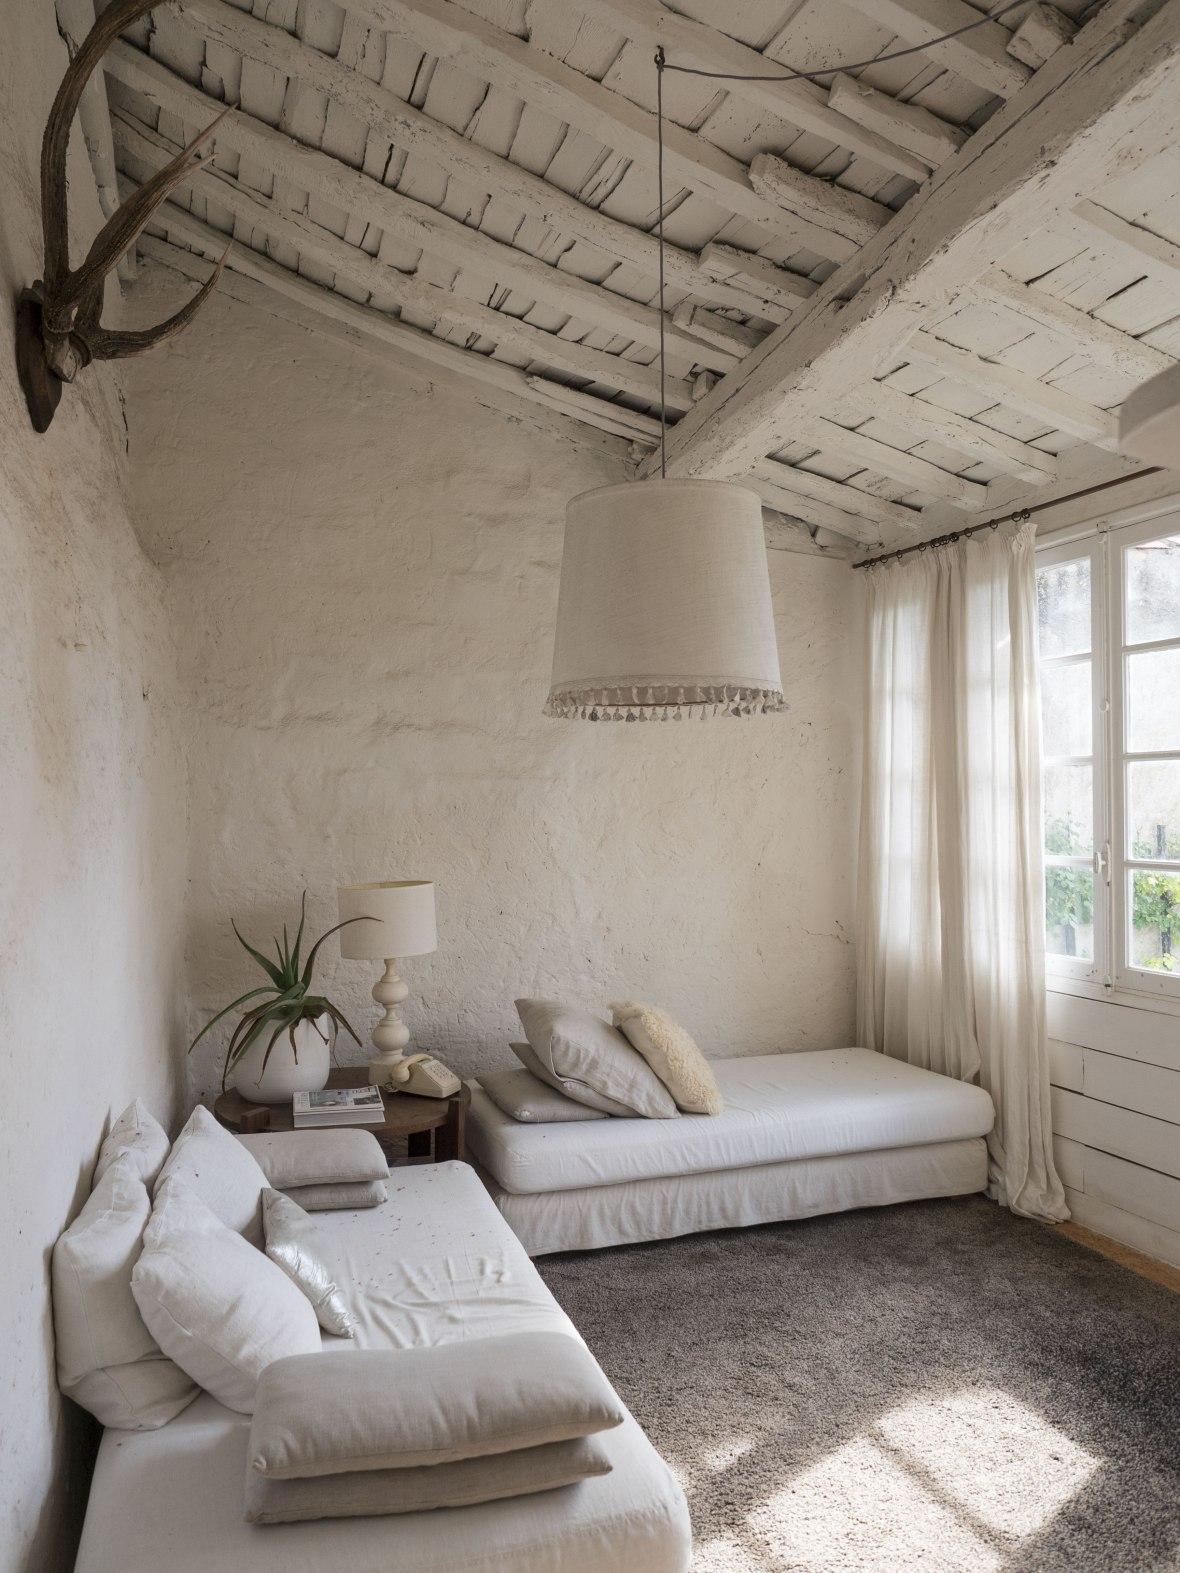 camellas-lloret-garden-apartement-linving-room.jpg